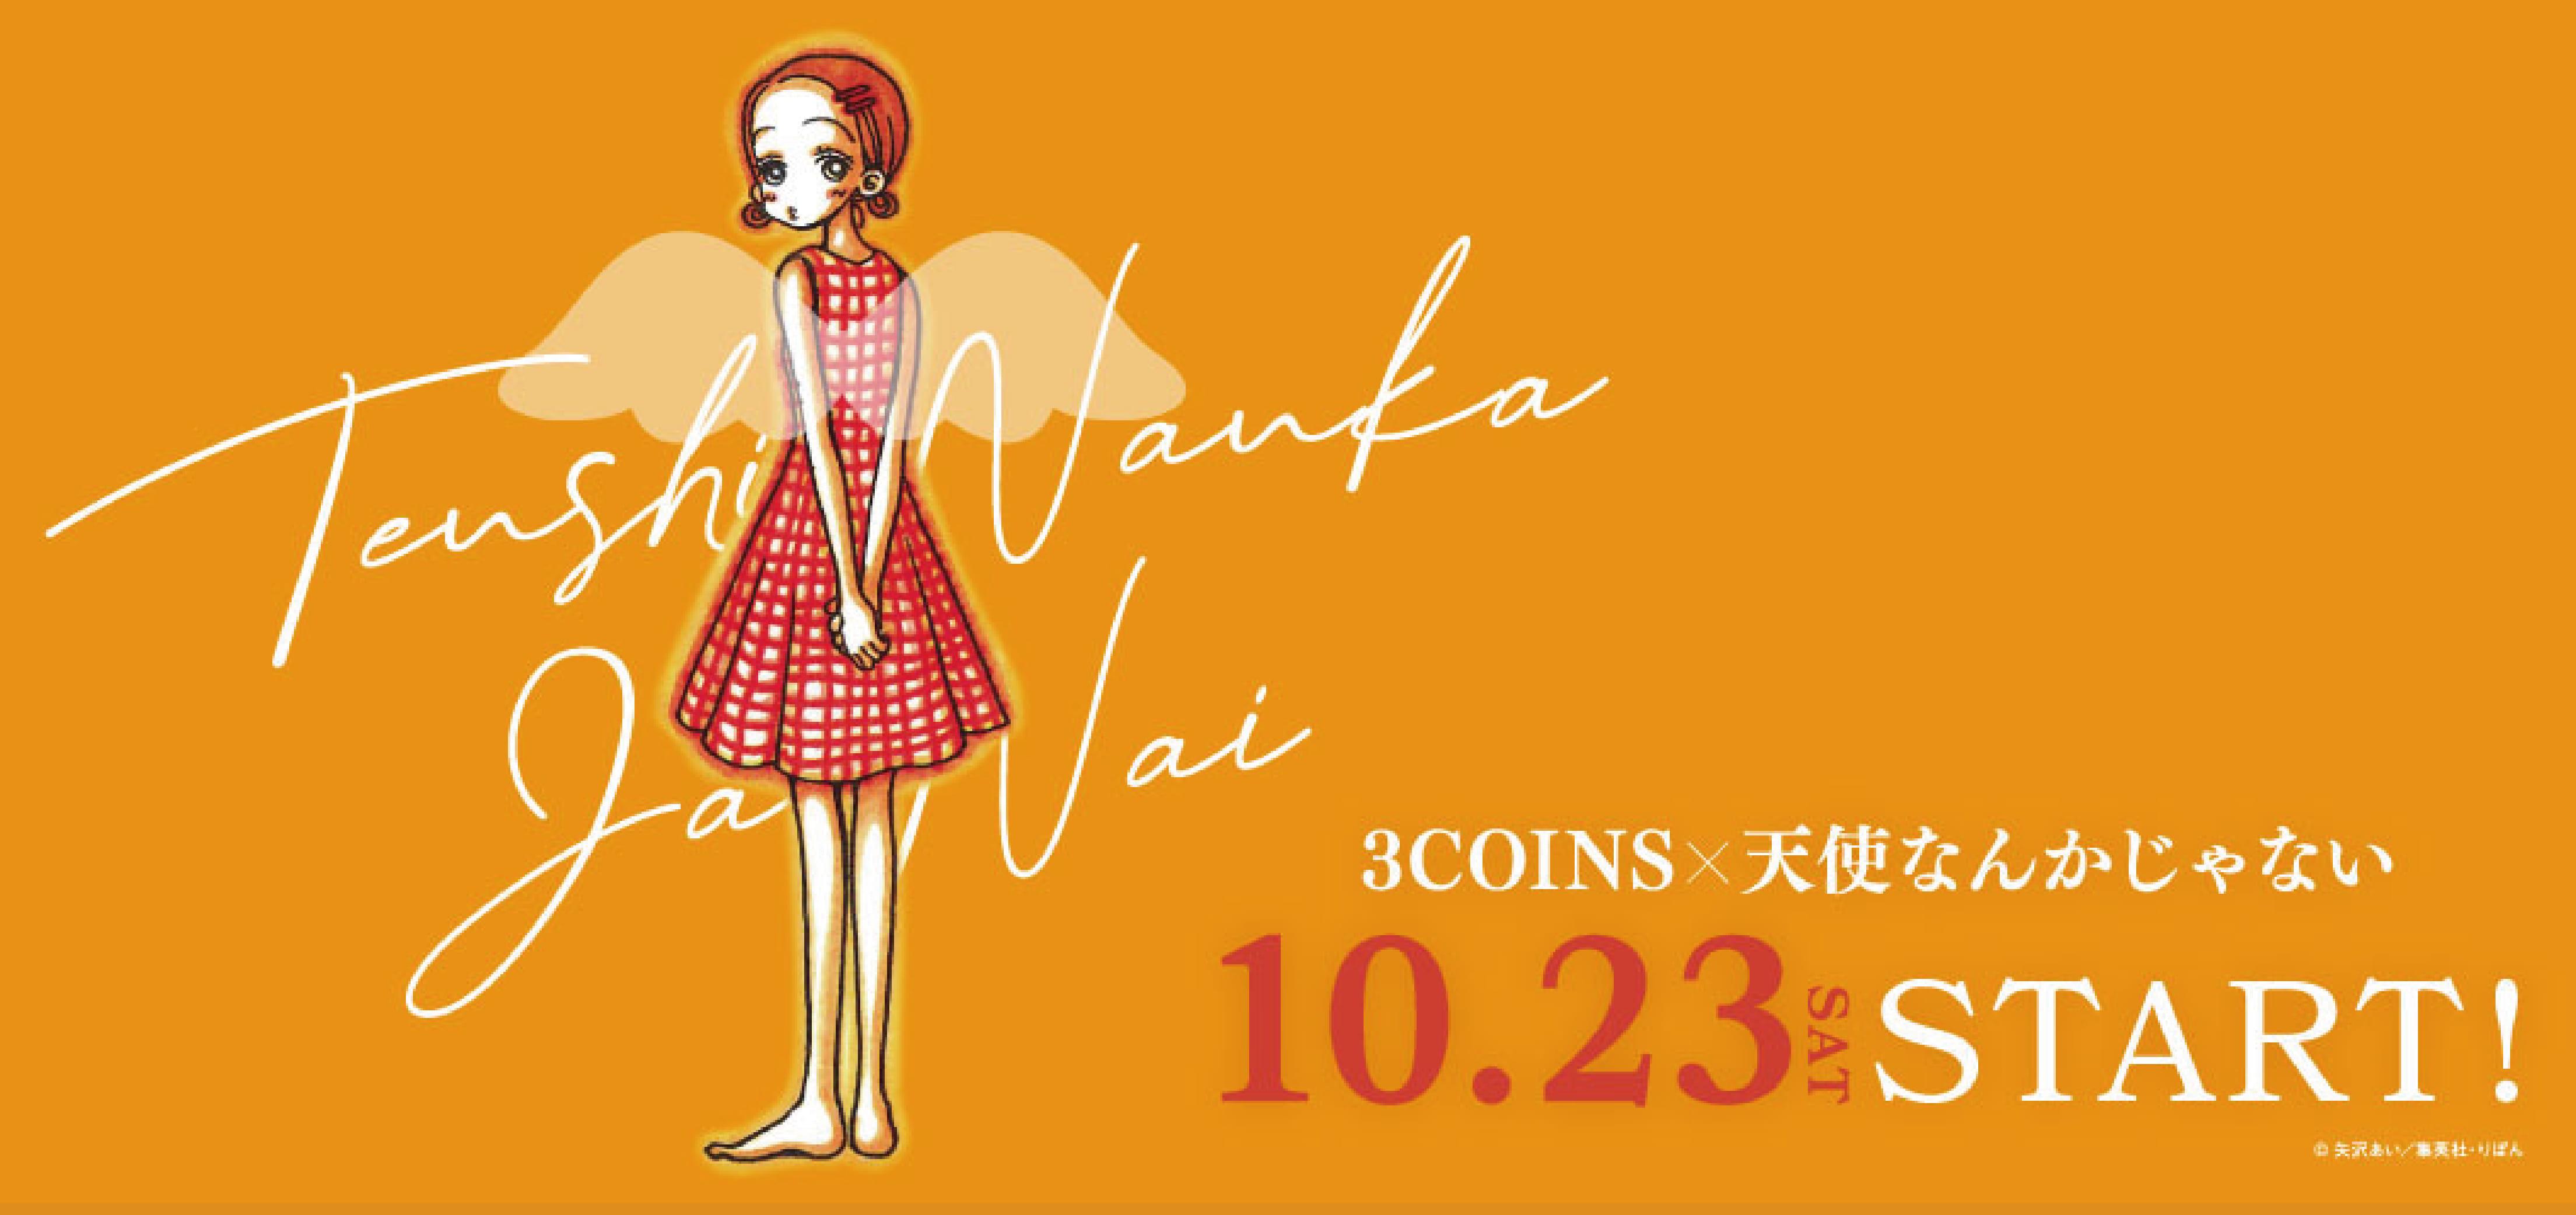 【3COINS】『3COINS×天使なんかじゃない』コラボアイテム 発売決定!